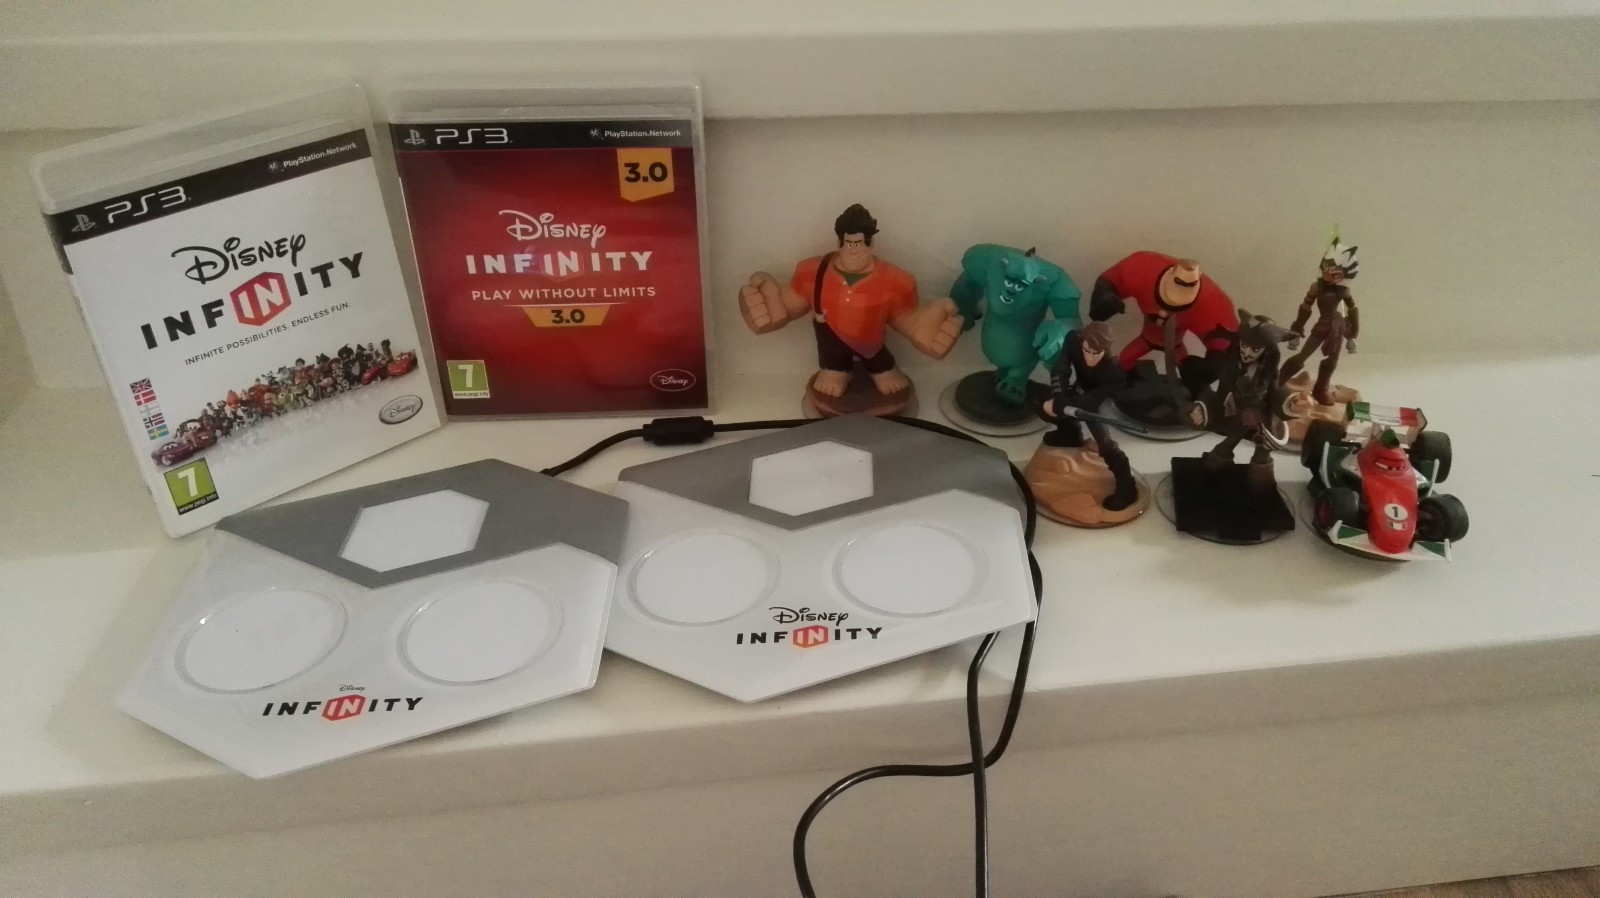 Disney Infinity Pakke - Kråkerøy  - Disney Infinity til PS3 selges. 2 stk spill: Disney Infinity og Disney Infinity 3.0 2 stk portaler 8 stk figurer - Kråkerøy